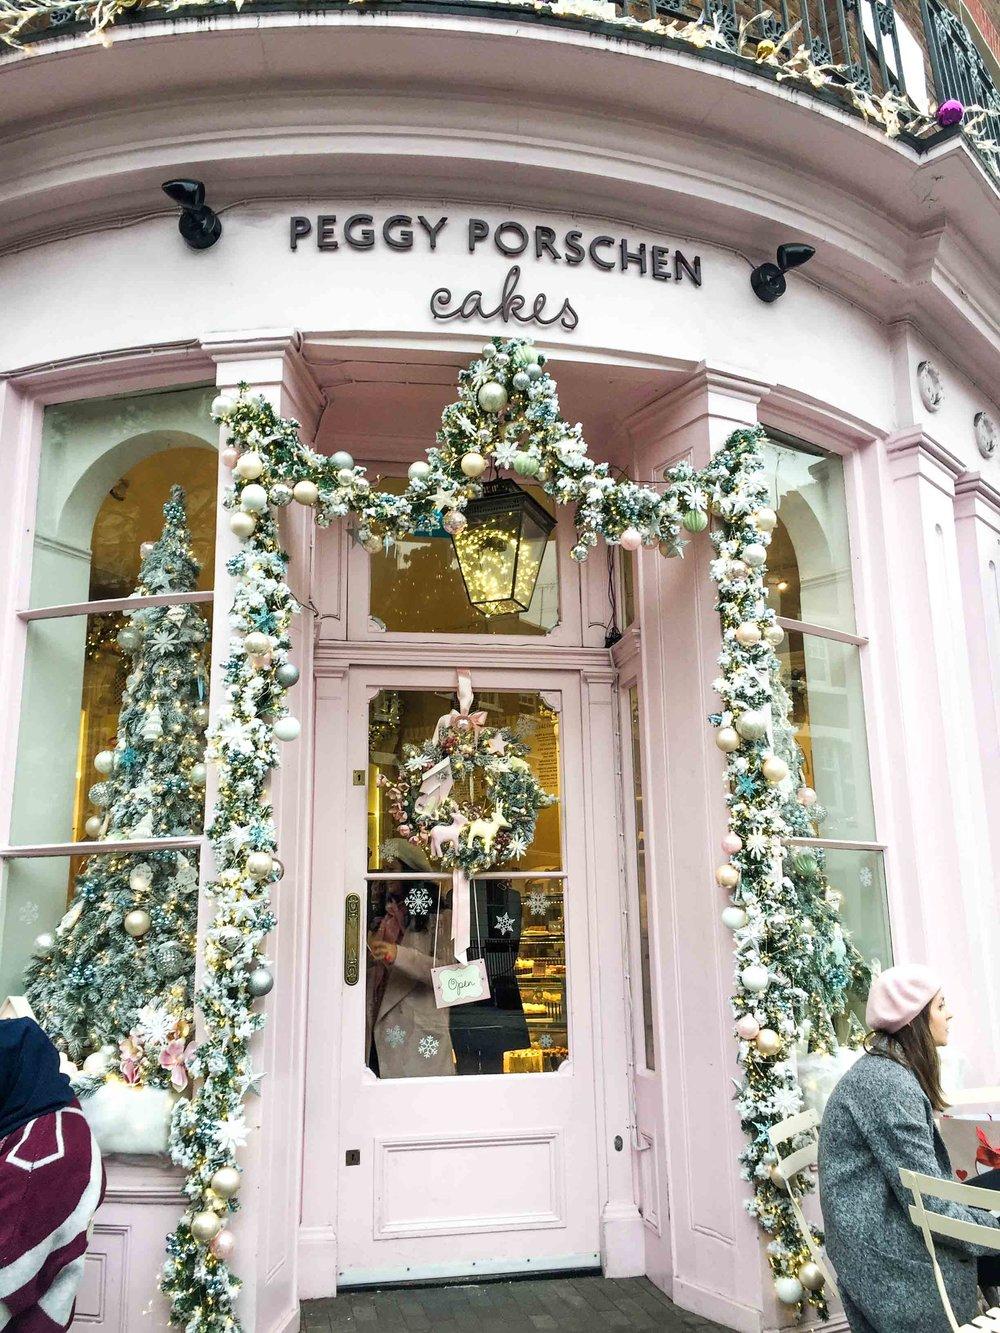 Pastel pink Peggy Porschen Cakes, bakery in London's Belgravia.